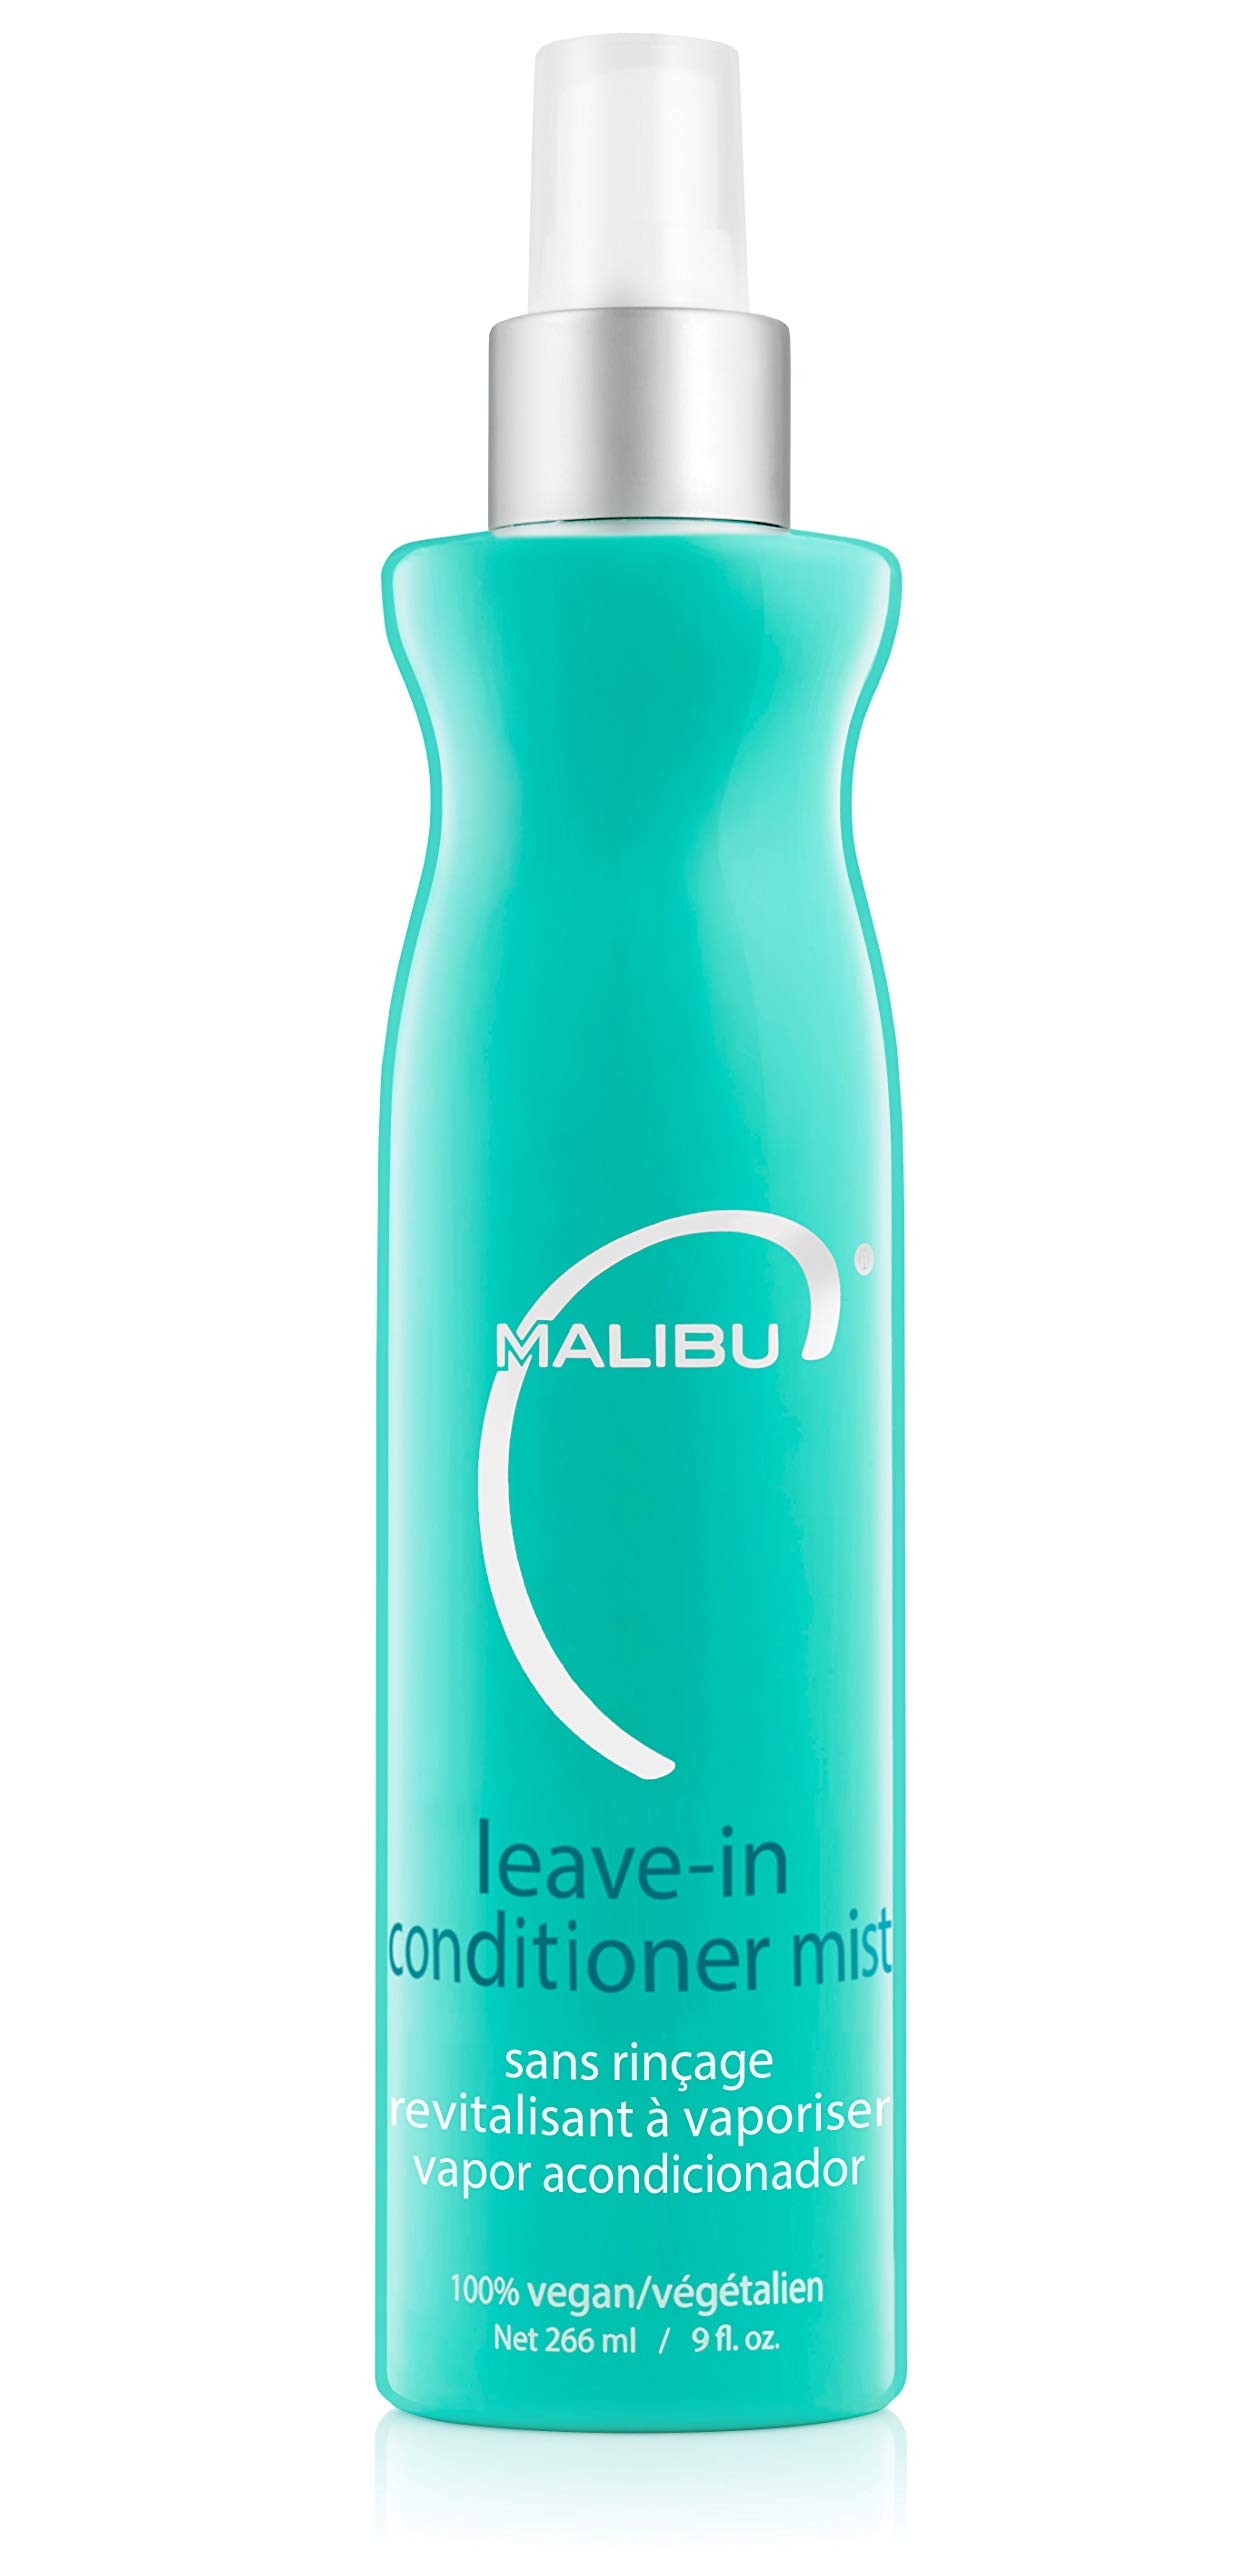 Malibu C Leave-In Conditioner Mist, 9 fl. oz. by Malibu C